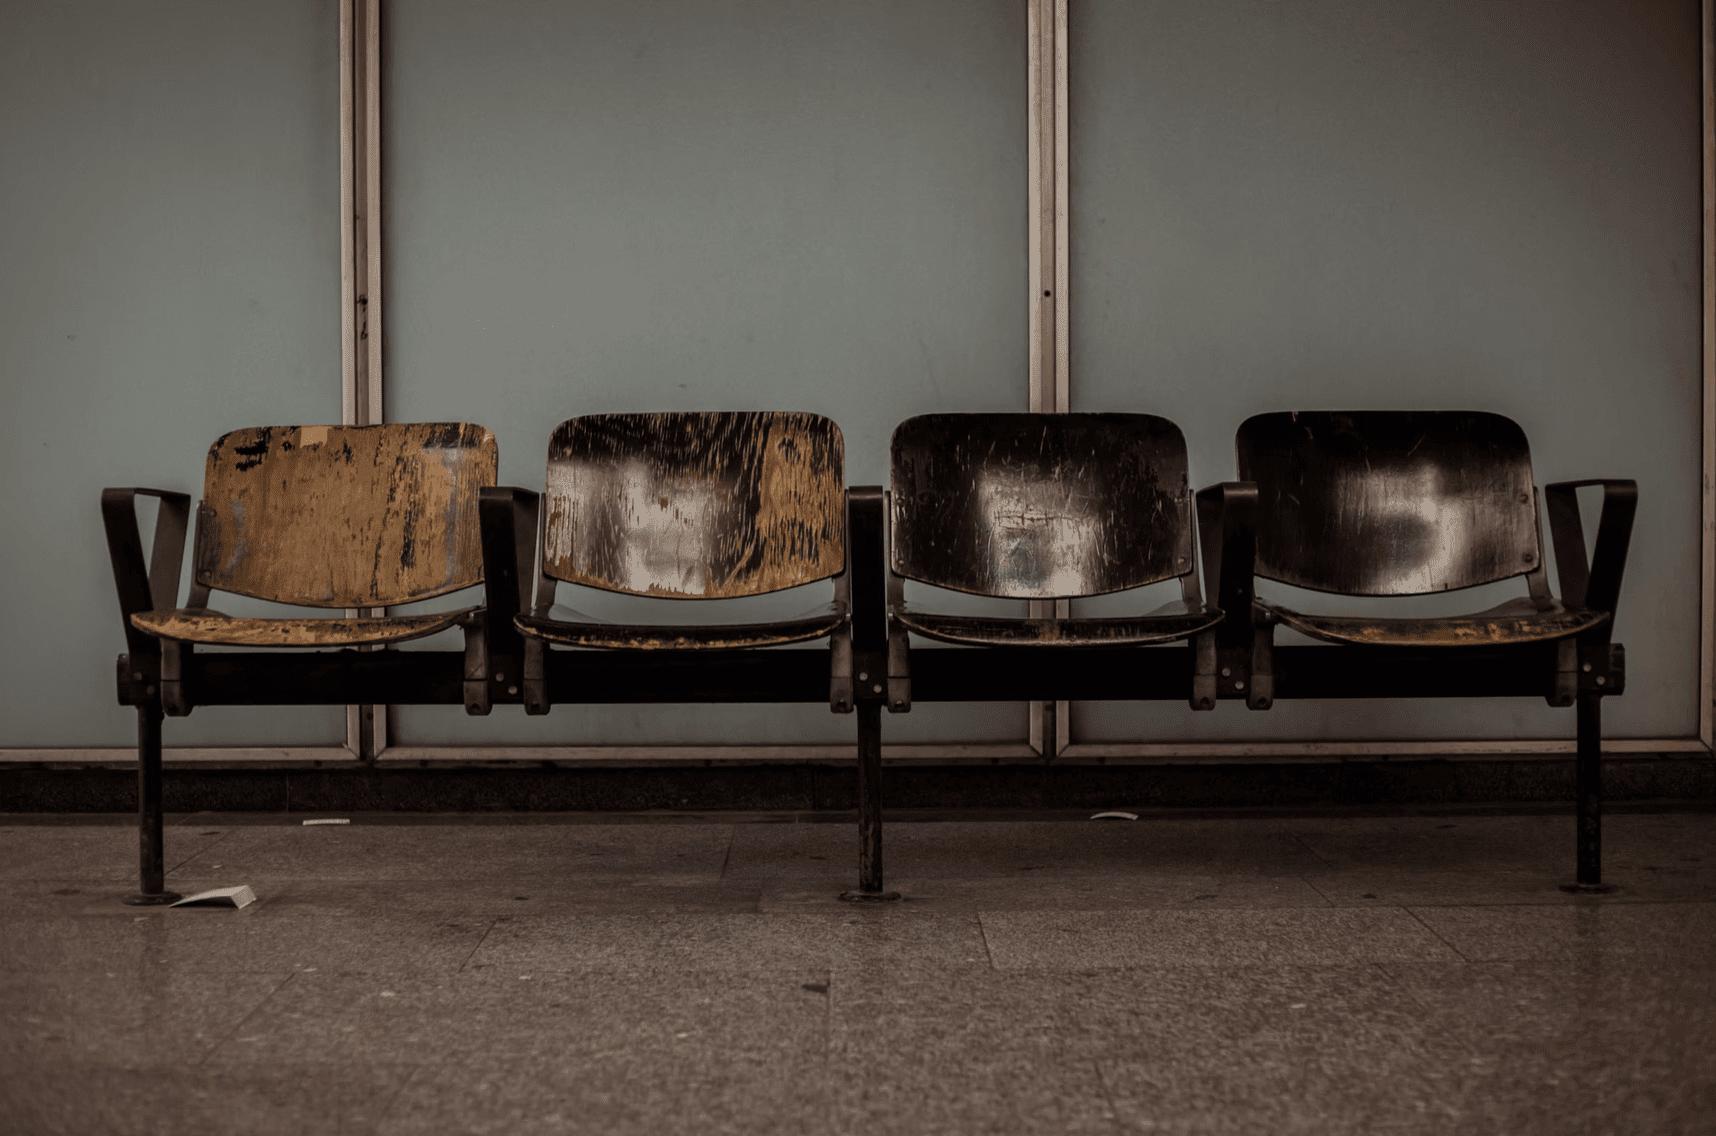 job interview waiting room seats